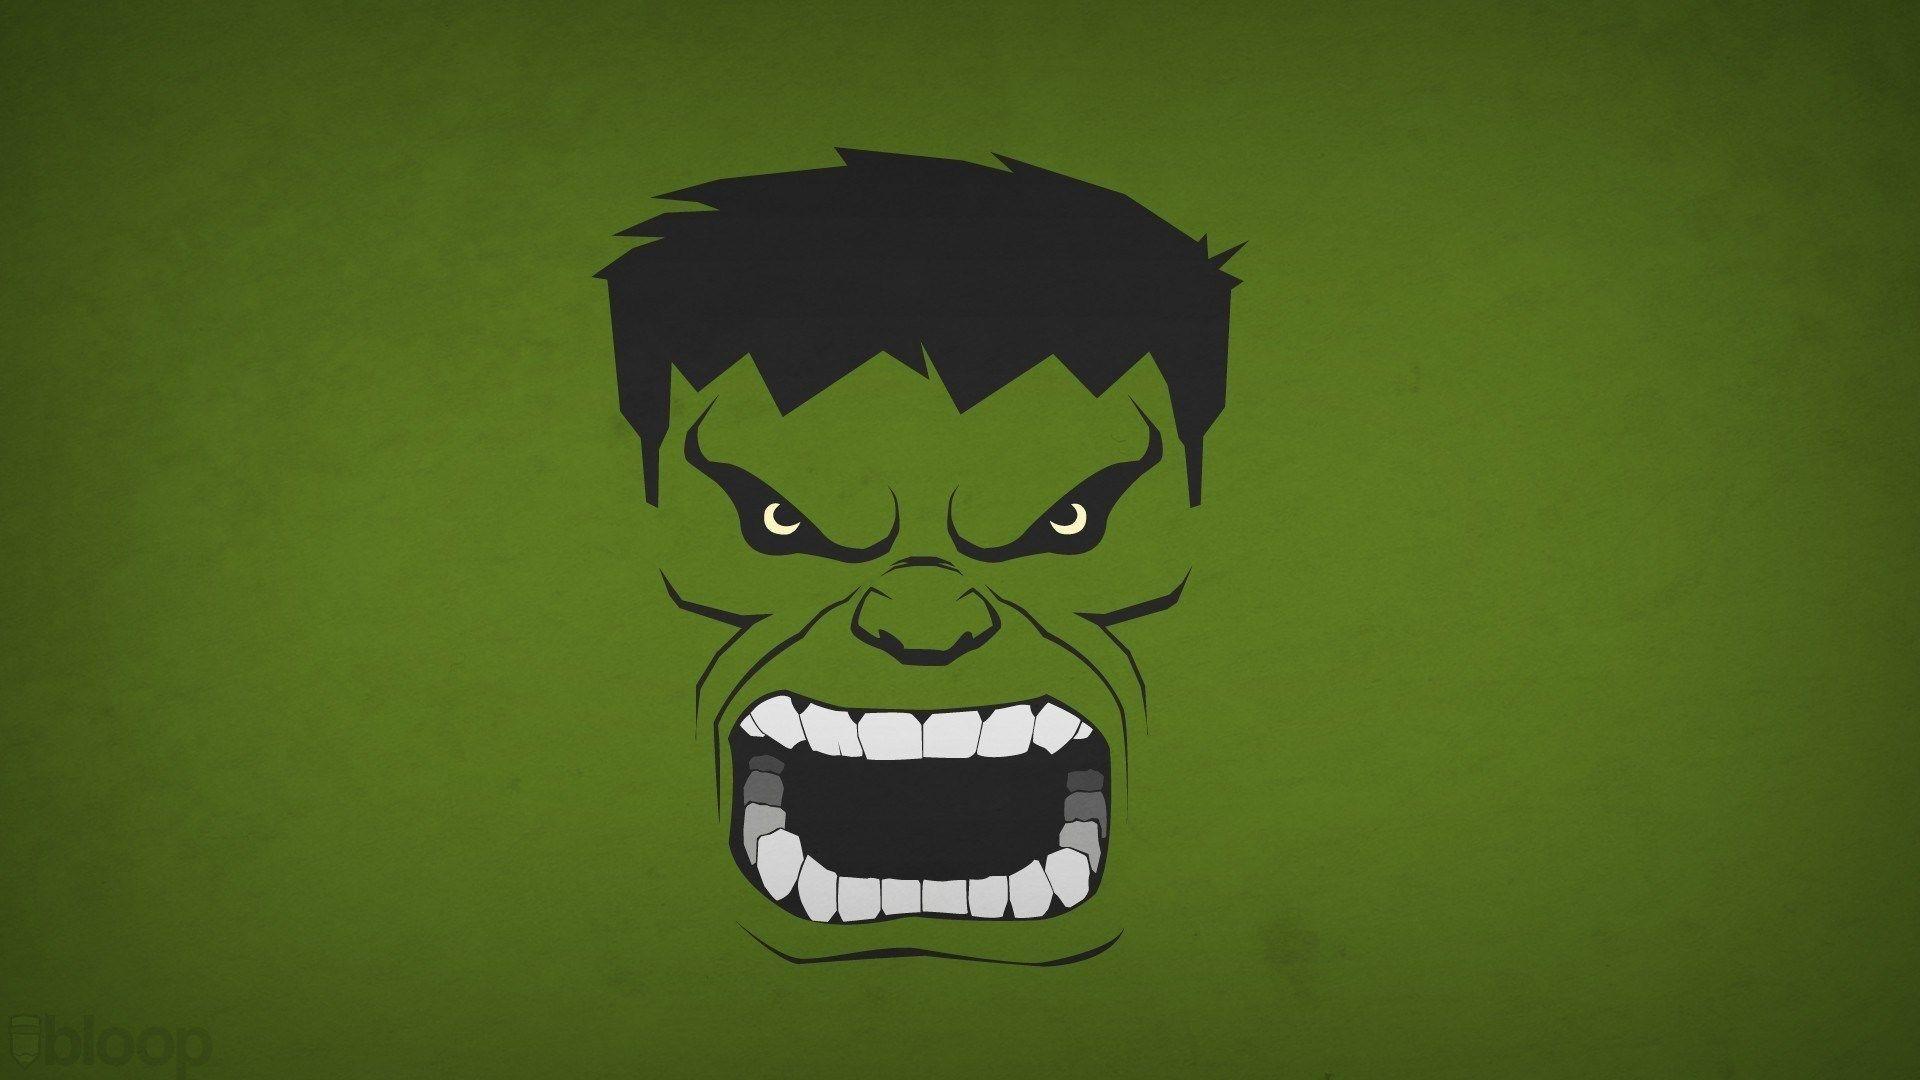 Hulk Cartoon 4k Wallpapers Top Free Hulk Cartoon 4k